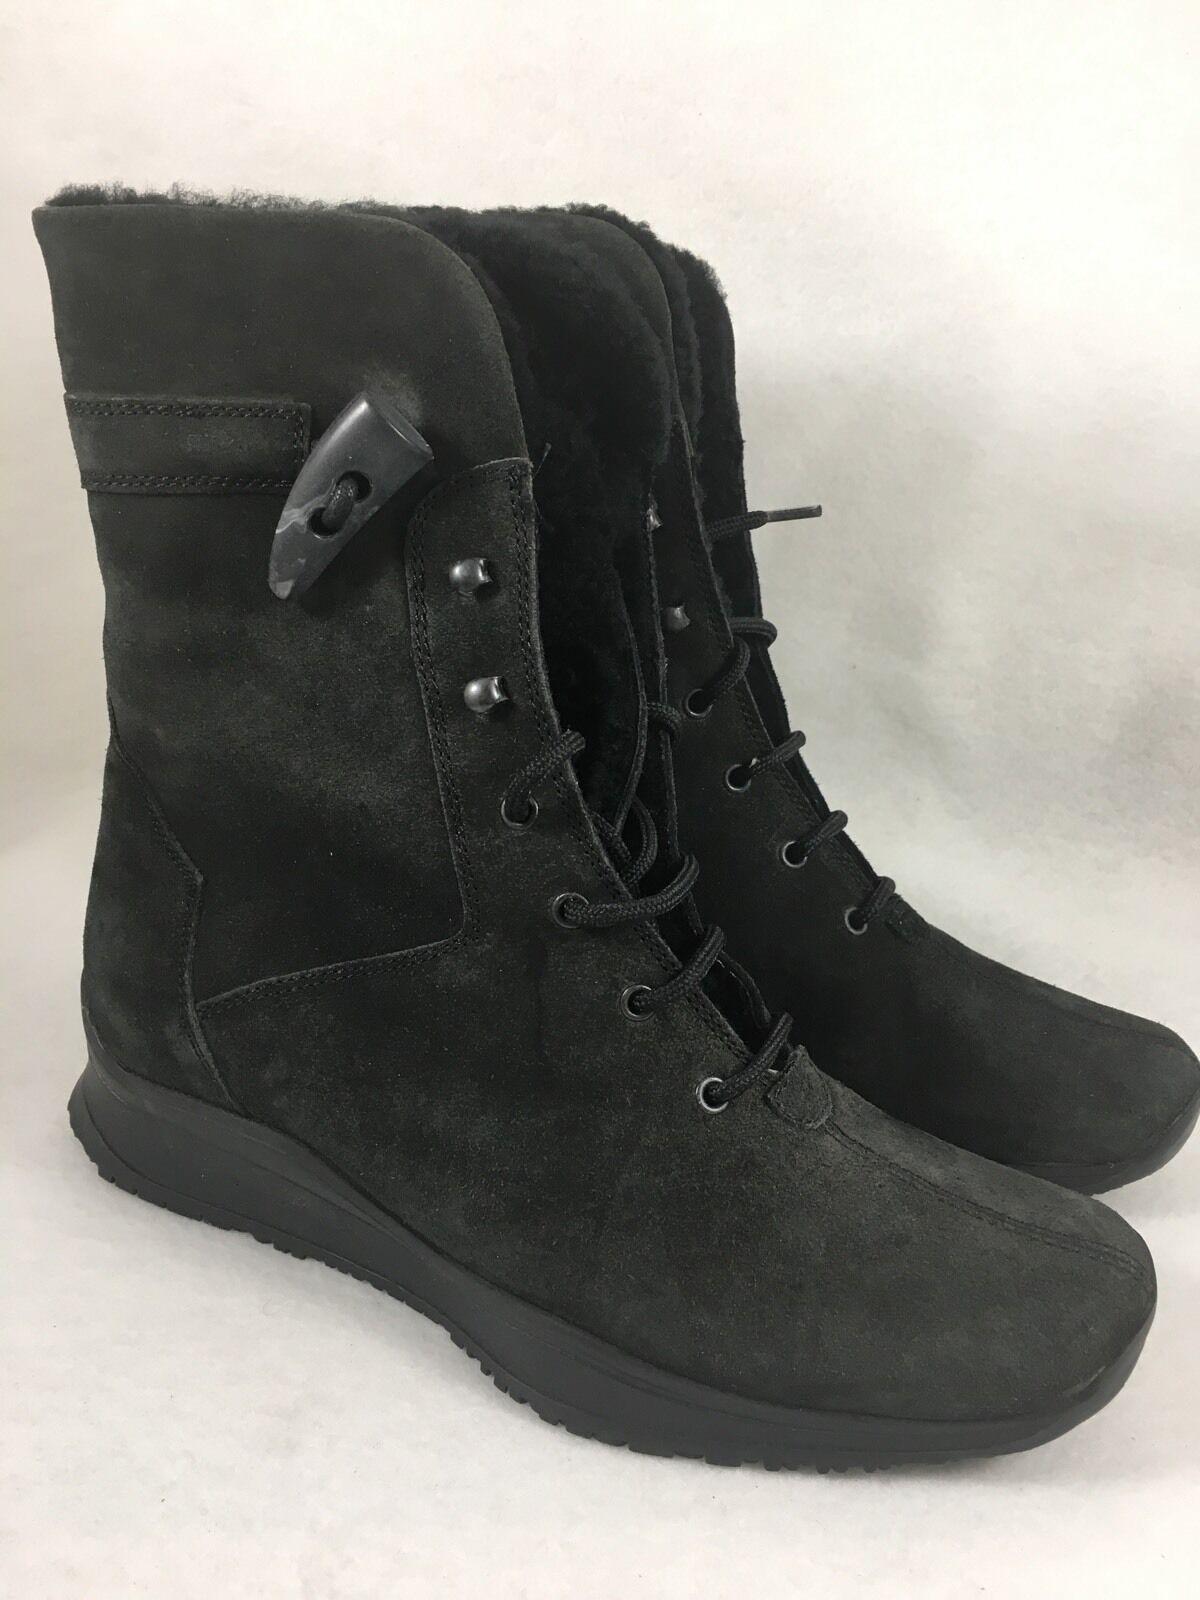 Aquatalia Marvin K. Rusty Black Suede Lace up Combat Ankle Boot Weatherproof 5.5